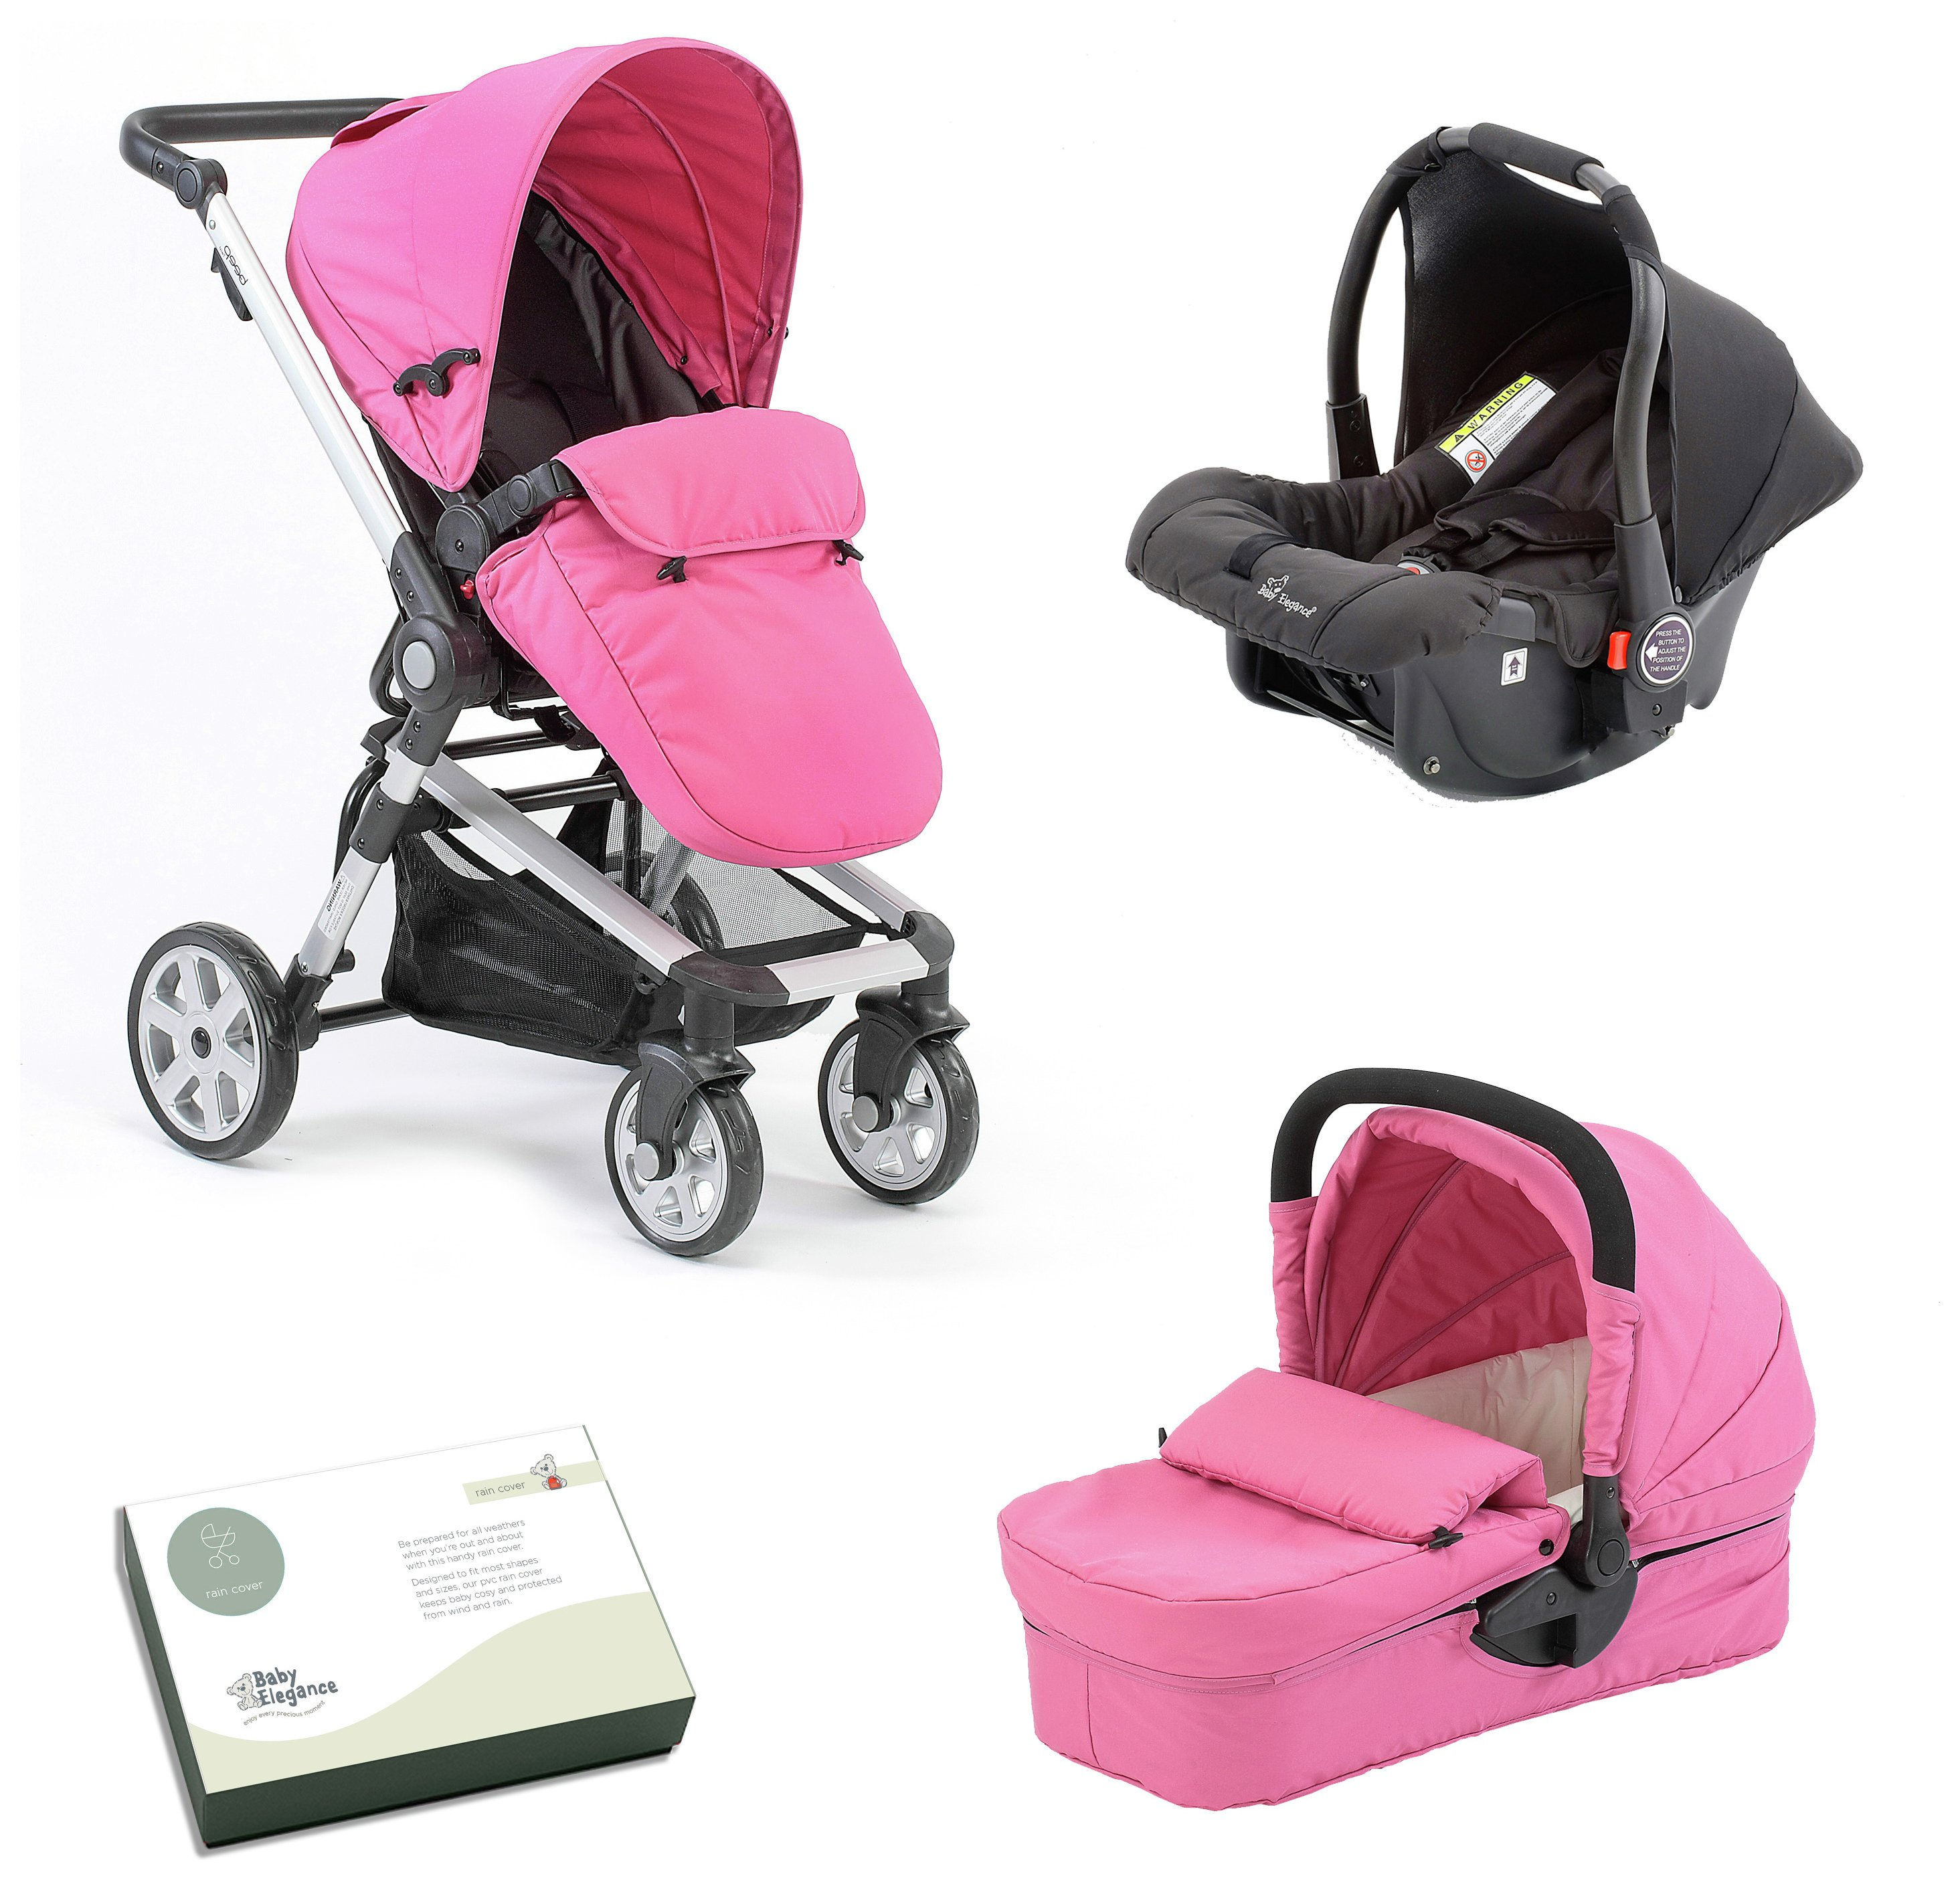 Image of Baby Elegance Beep Twist Travel System - Pink.